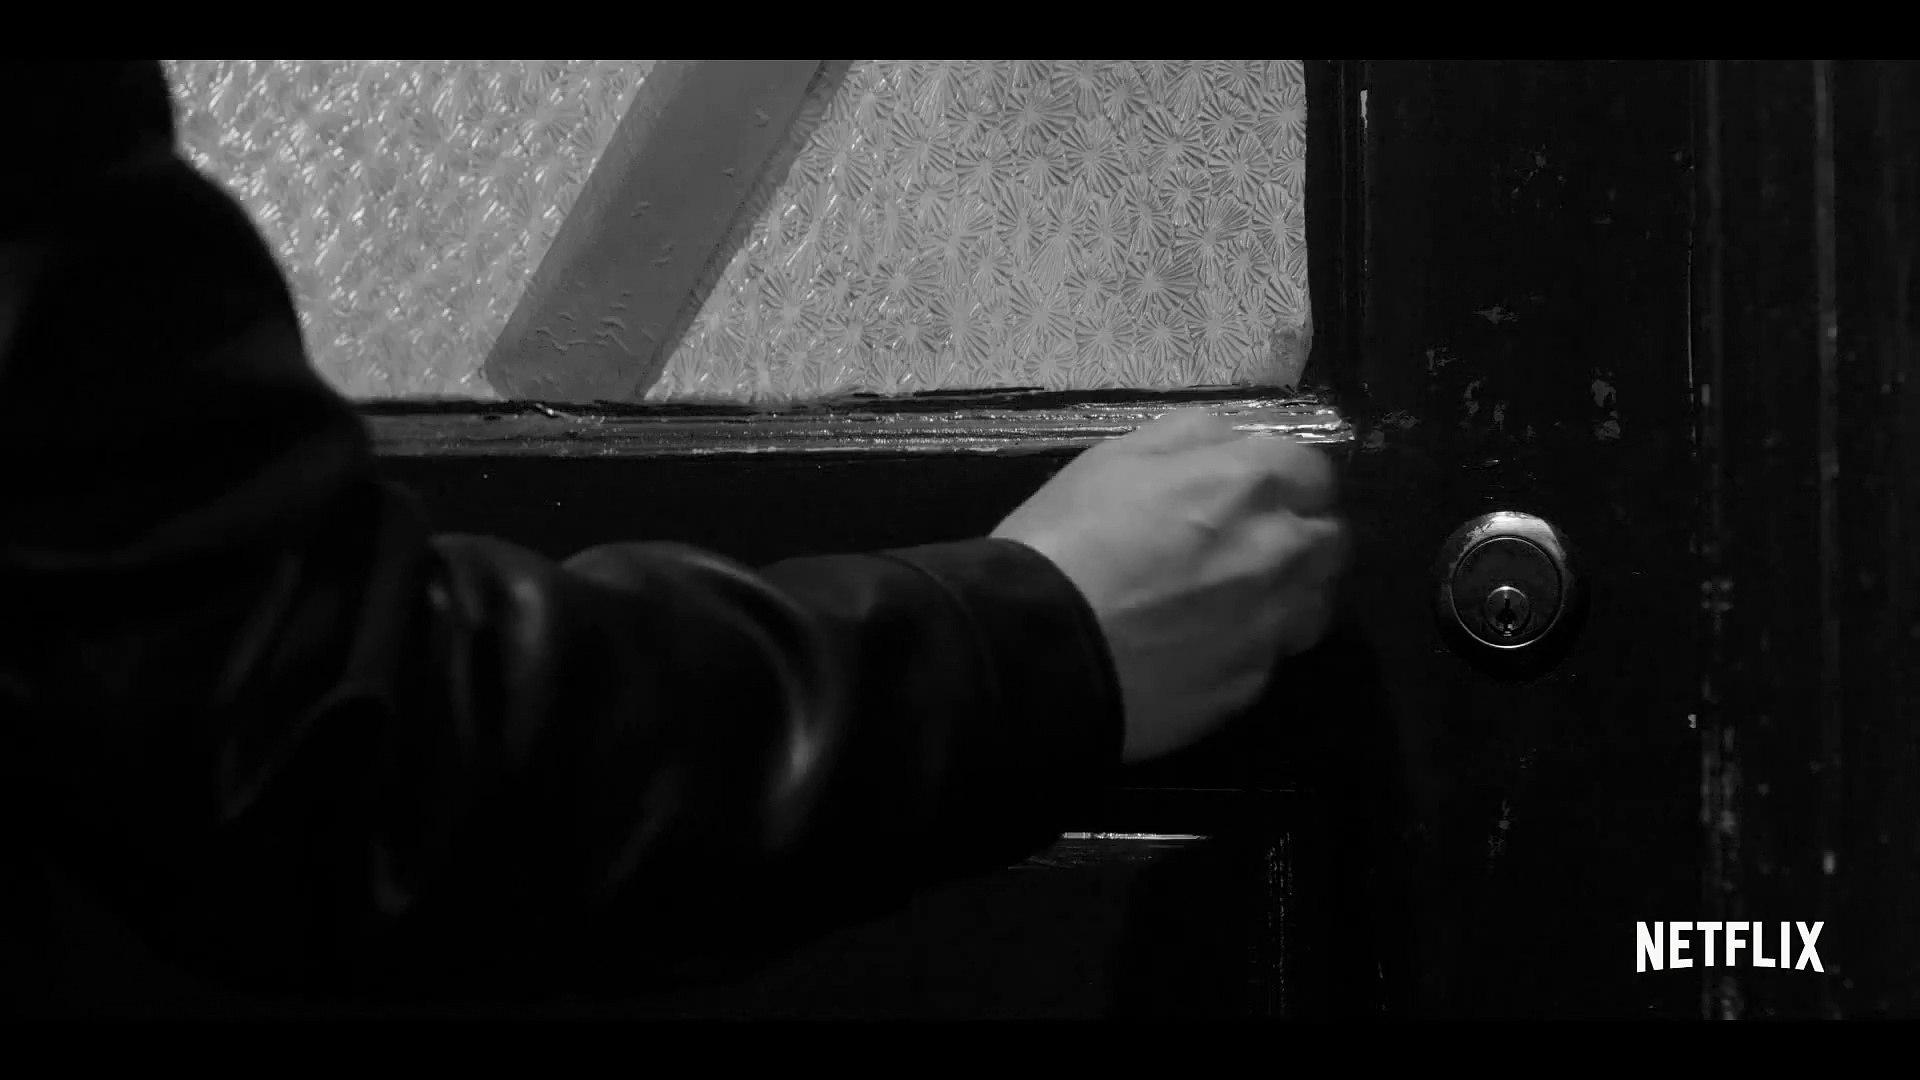 UNBREAKABLE KIMMY SCHMIDT S 3 TEASER TRAILER (2016) Netflix Comedy Series